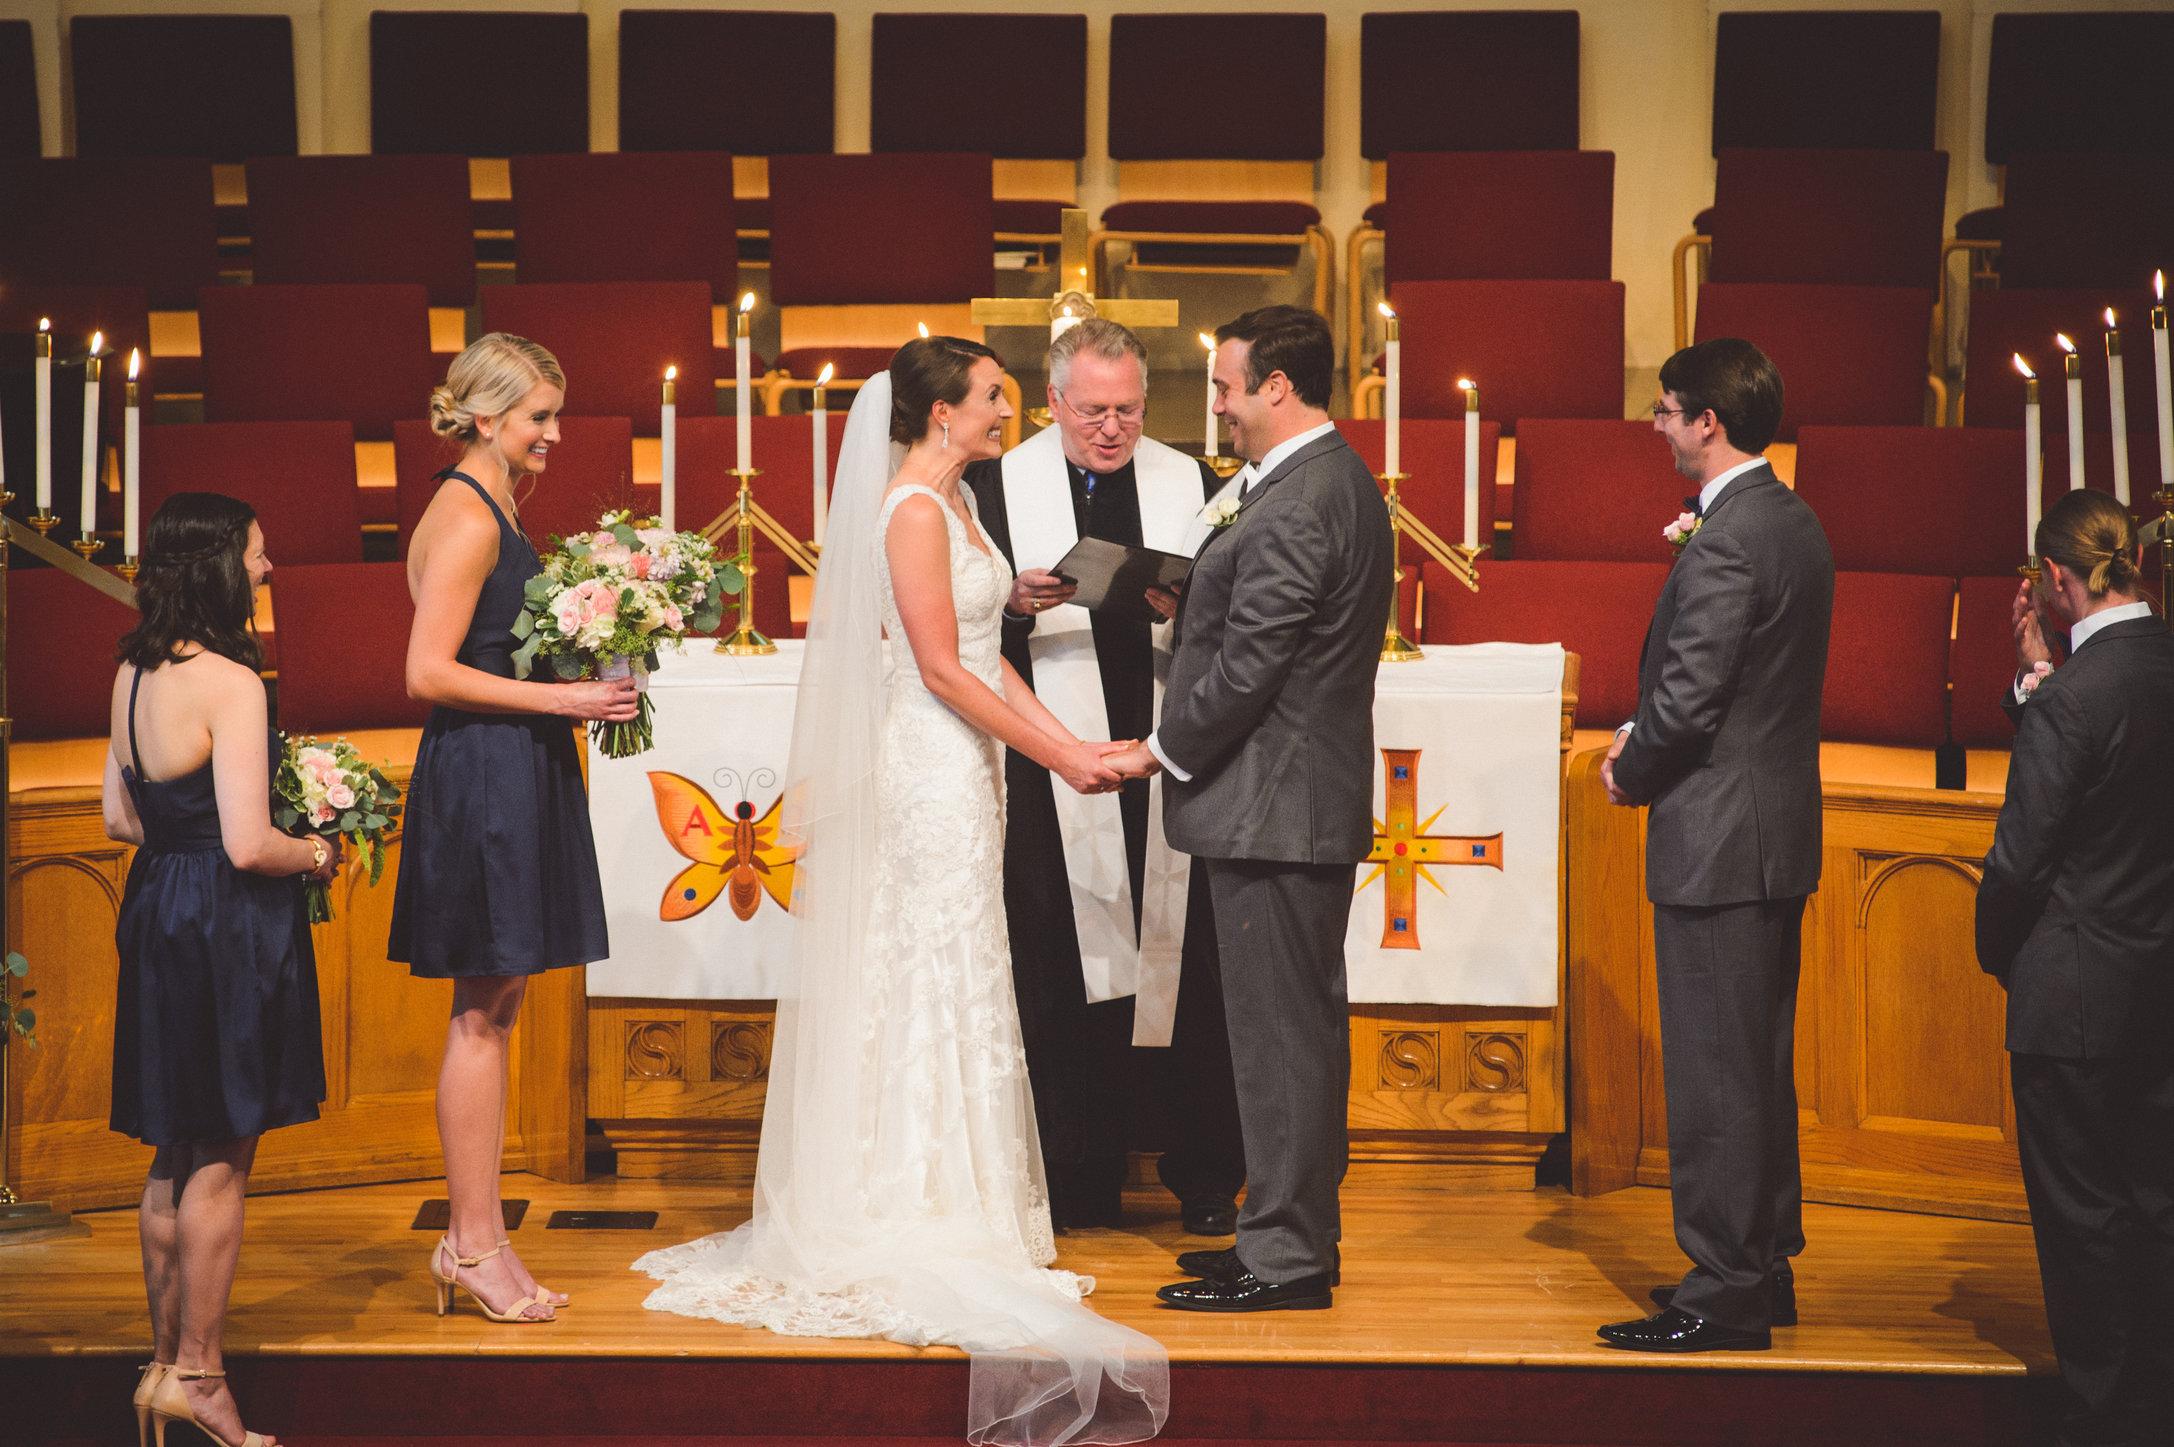 SandC-wedding-218.jpg